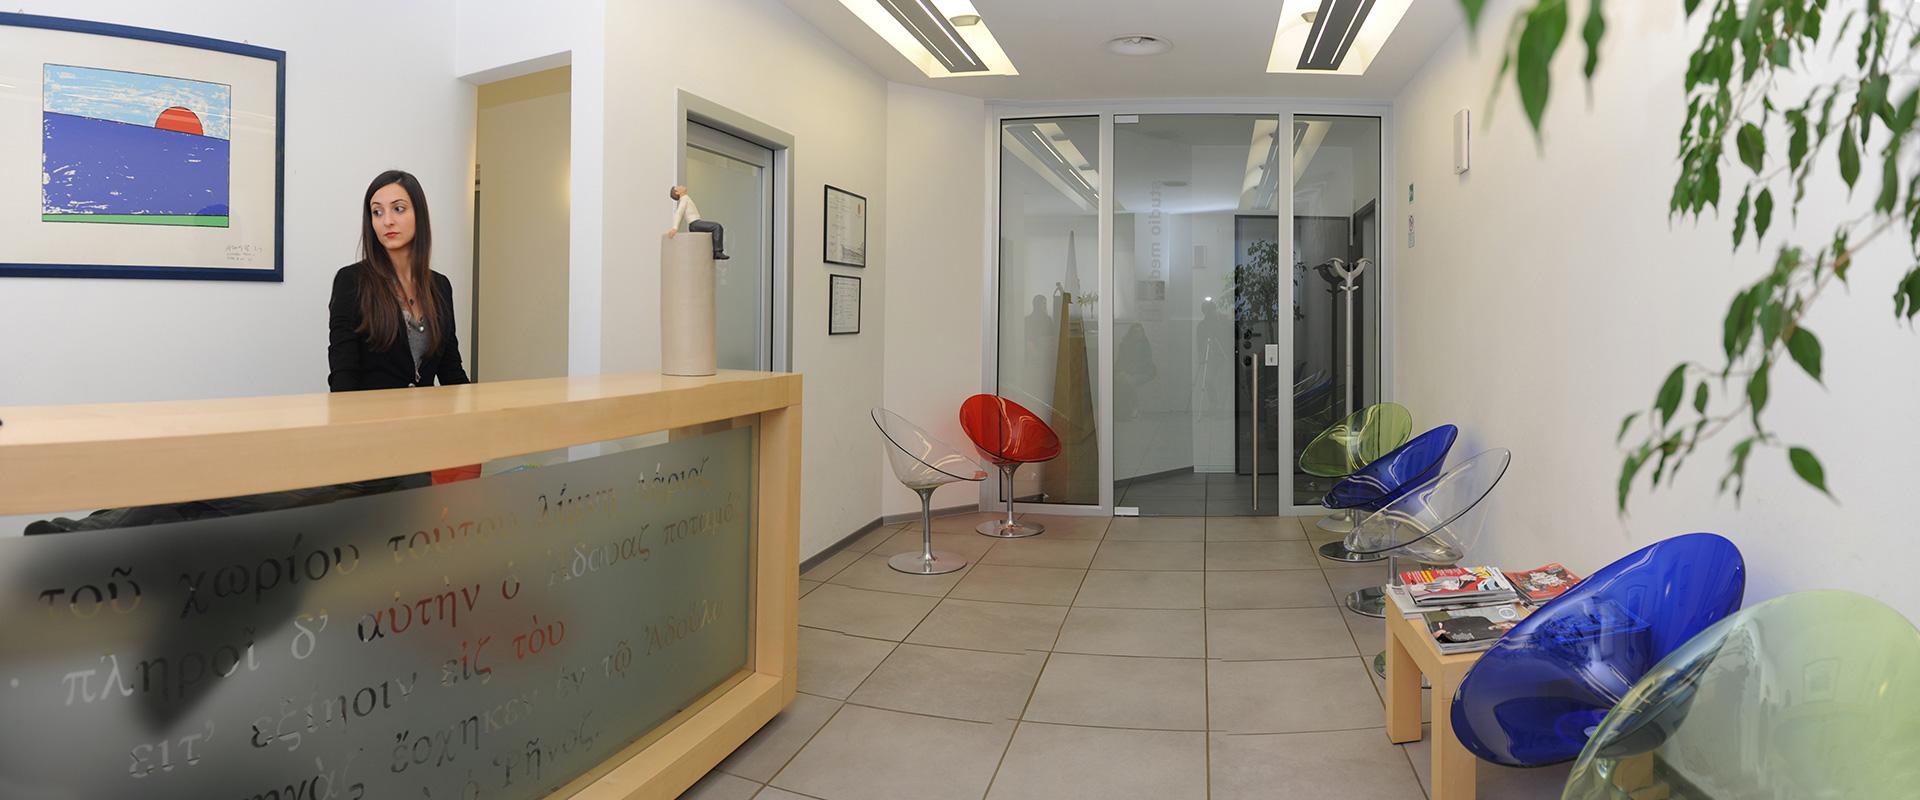 studio-dentistico-simone-hall